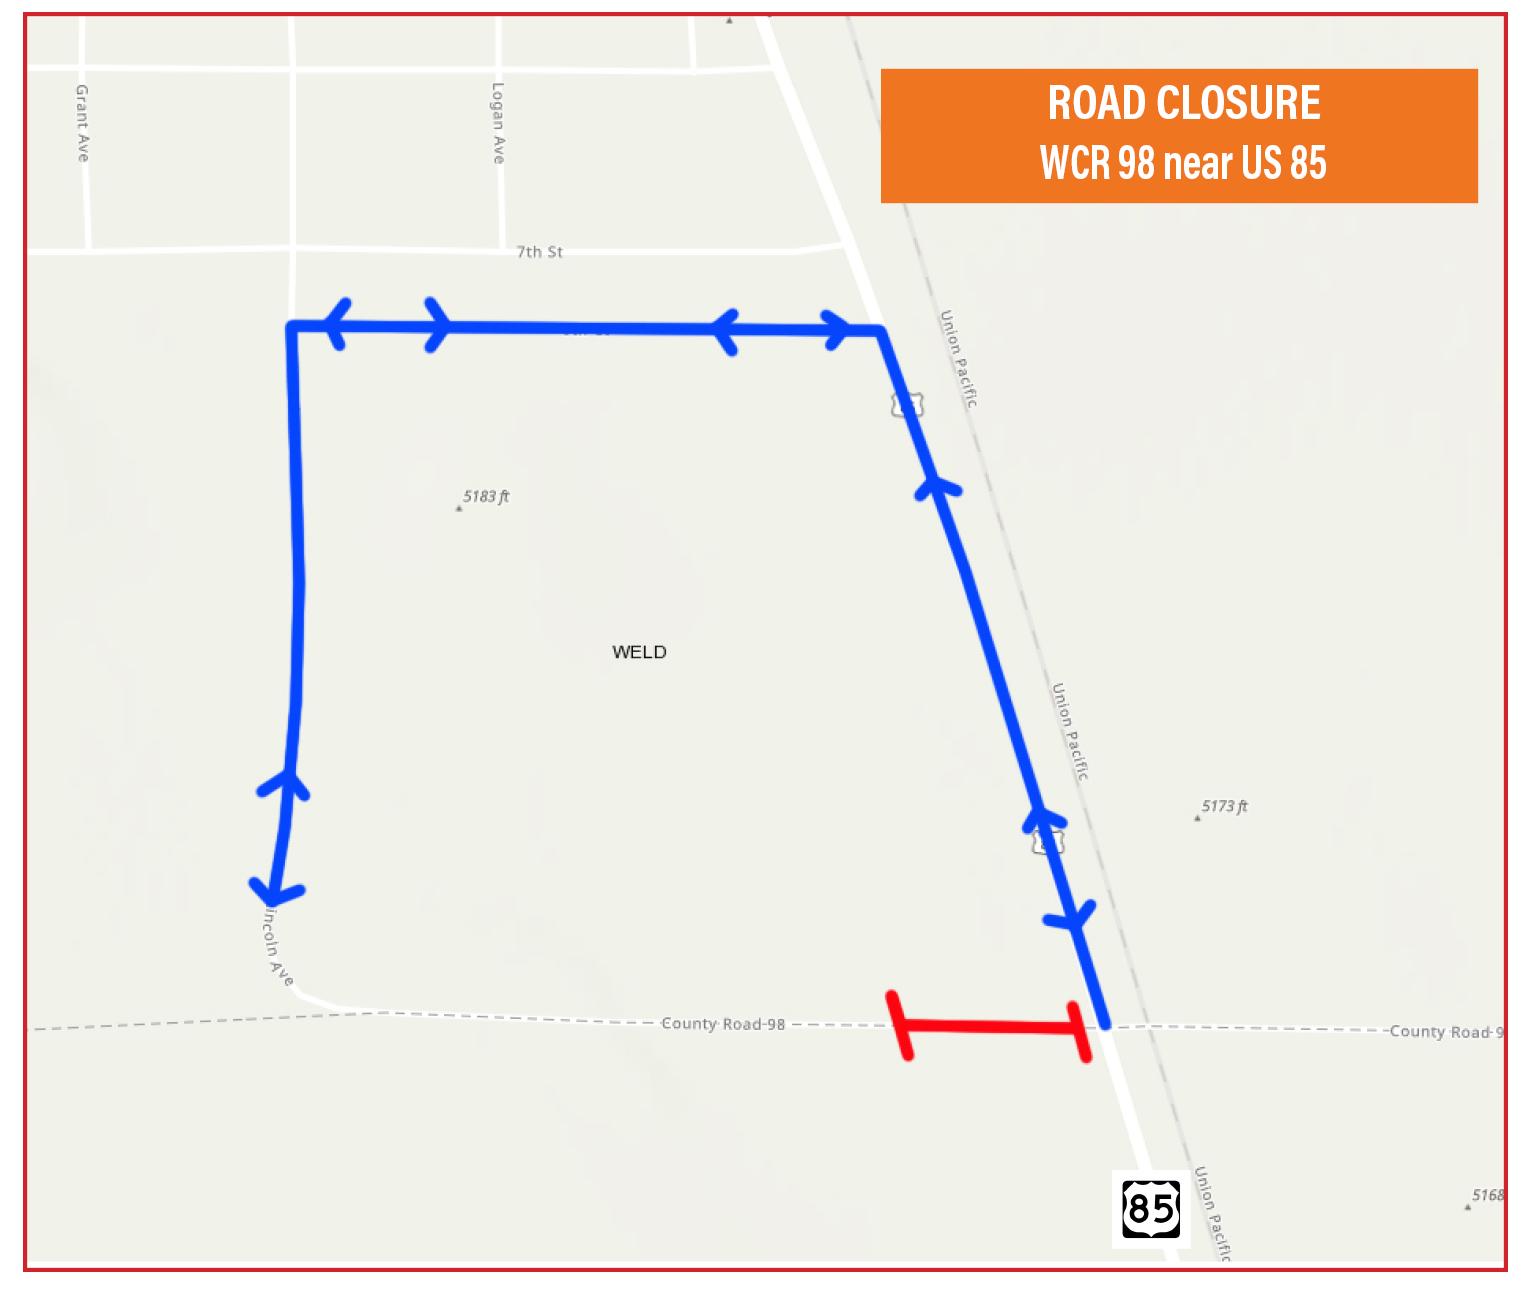 CR 98 road closure map V.1 Final (1).jpg detail image